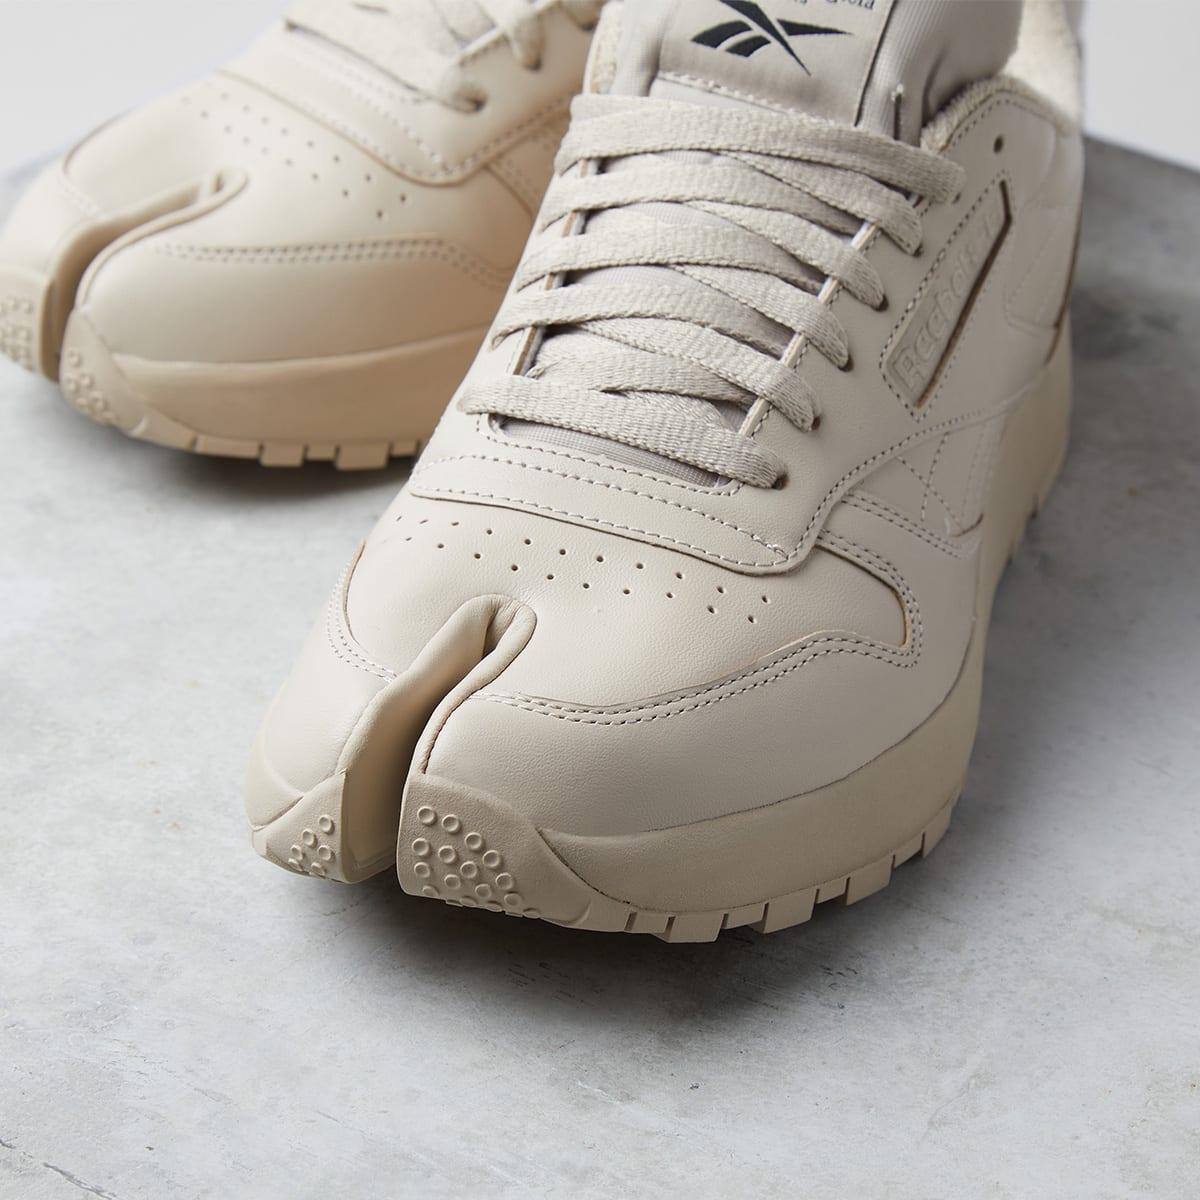 Reebok x Maison Margiela Project 0 Classic Leather Tabi - GX5141